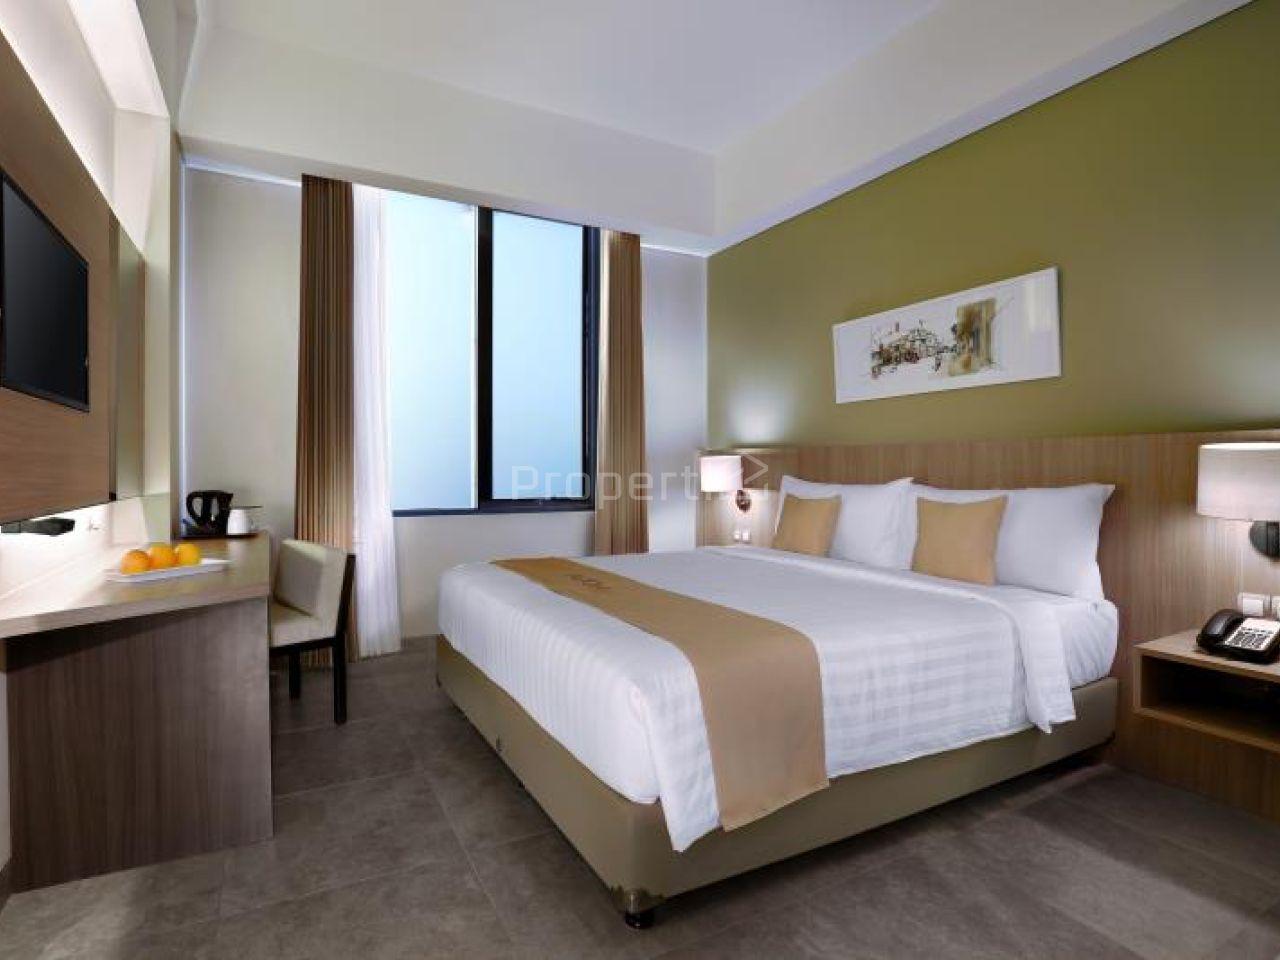 Hotel Bintang 4 di Kota Mataram, Kota Mataram